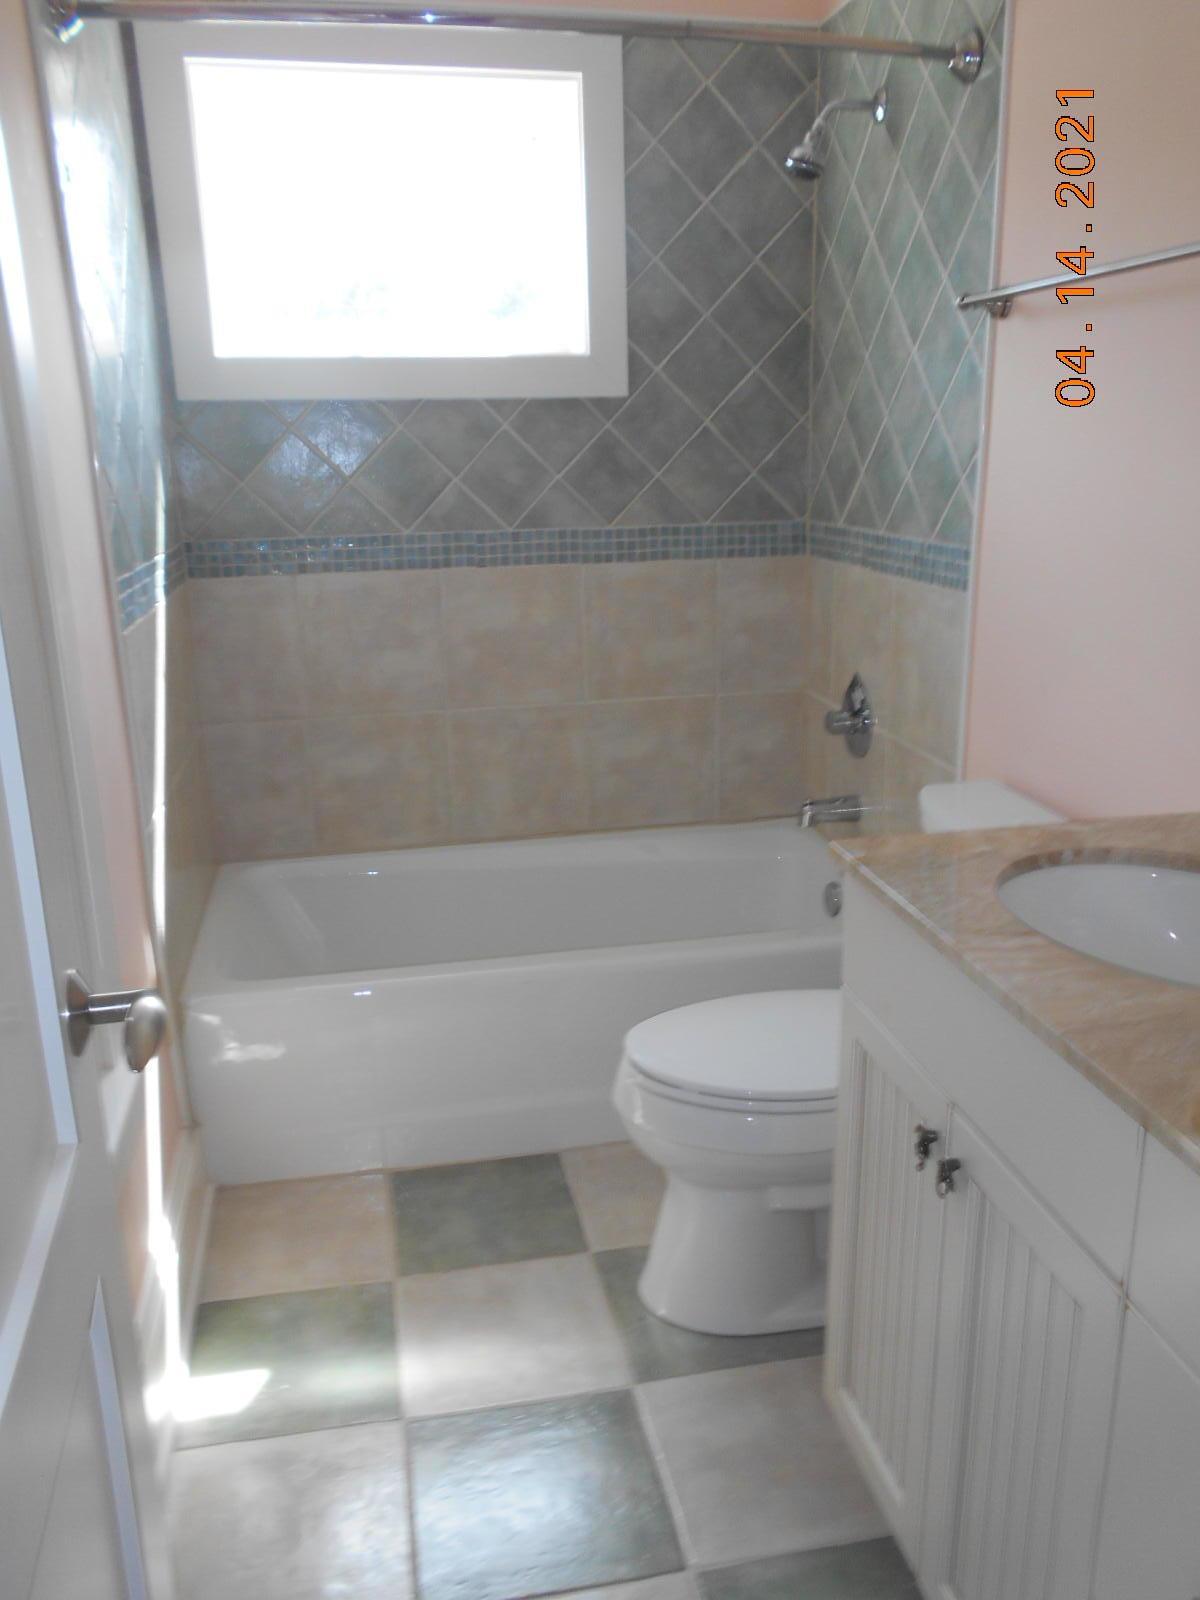 Beresford Creek Landing Homes For Sale - 1212 Winding Creek, Charleston, SC - 15